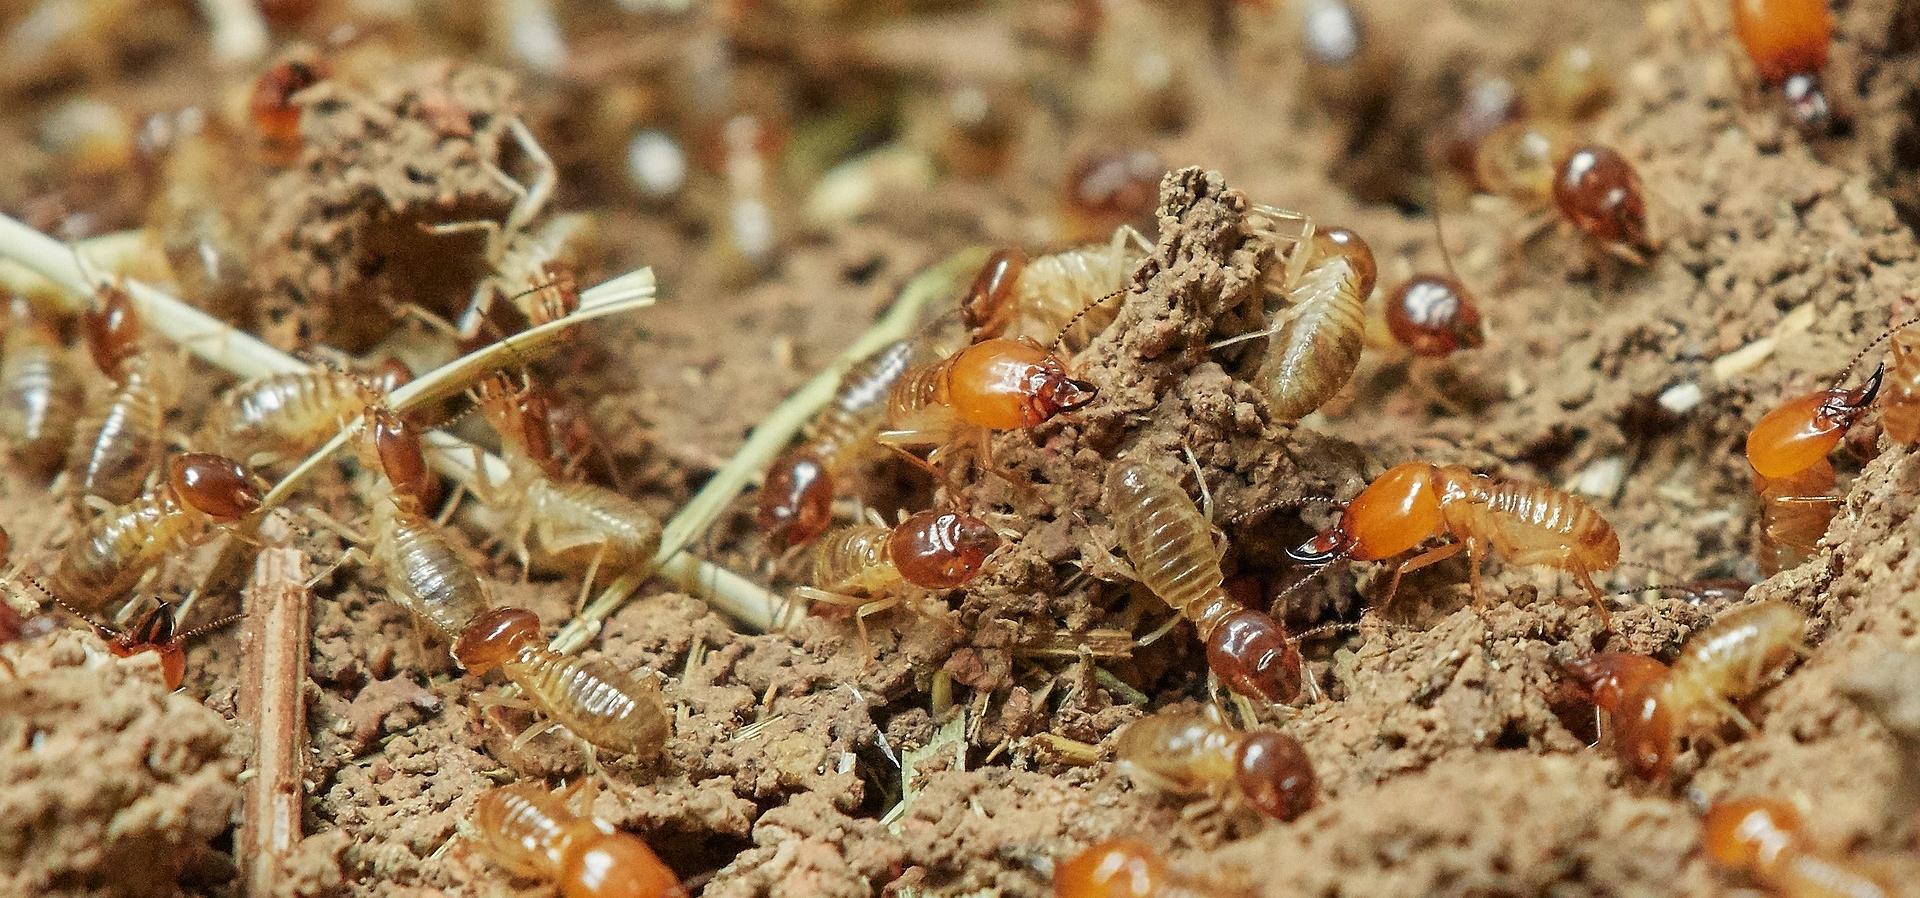 Bug Assassin Pest Management, Termite Treatment, Termite inspection, Vero beach termite company, Vero Beach Pest Control, Sebastian Pest Control, Exterminators, Vero Beach Exterminator, Sebastian Exterminator, Best pest control companies in Indian River County, subterranean termites